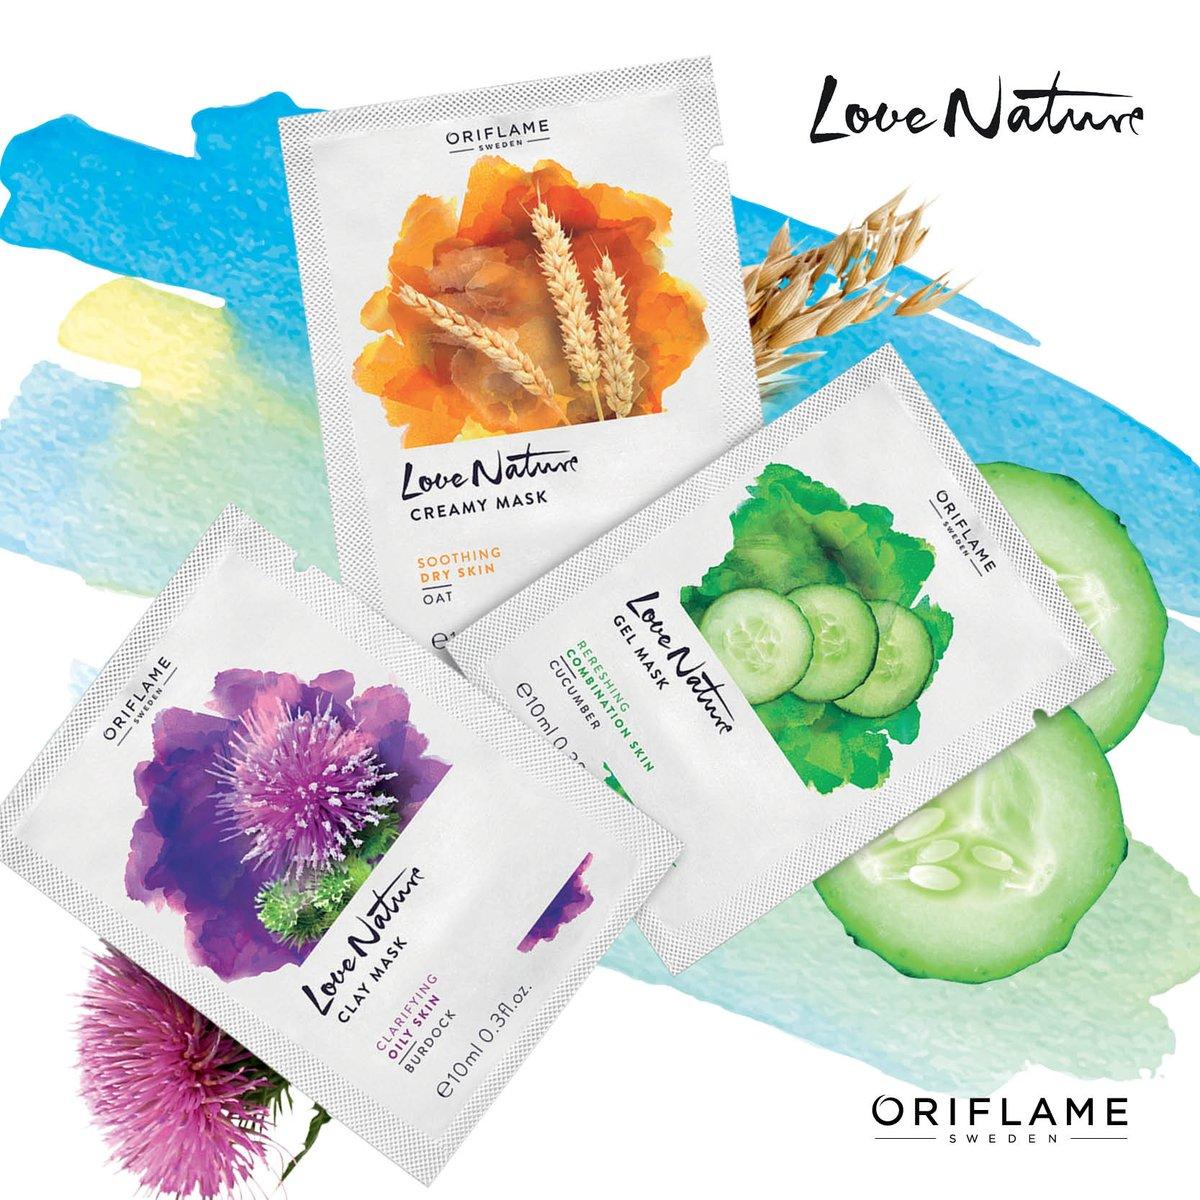 https://id.oriflame.com?store=bisniskosmetikdigital